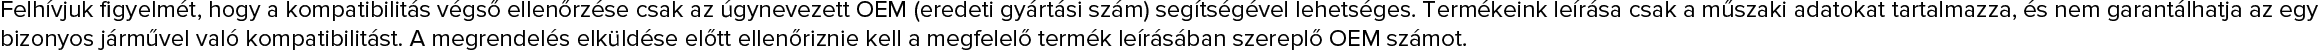 MANN-FILTER 1109 AQ, 1109 J3, 1109 Q1, 1109 Y8, 1930213 Olajszűrő